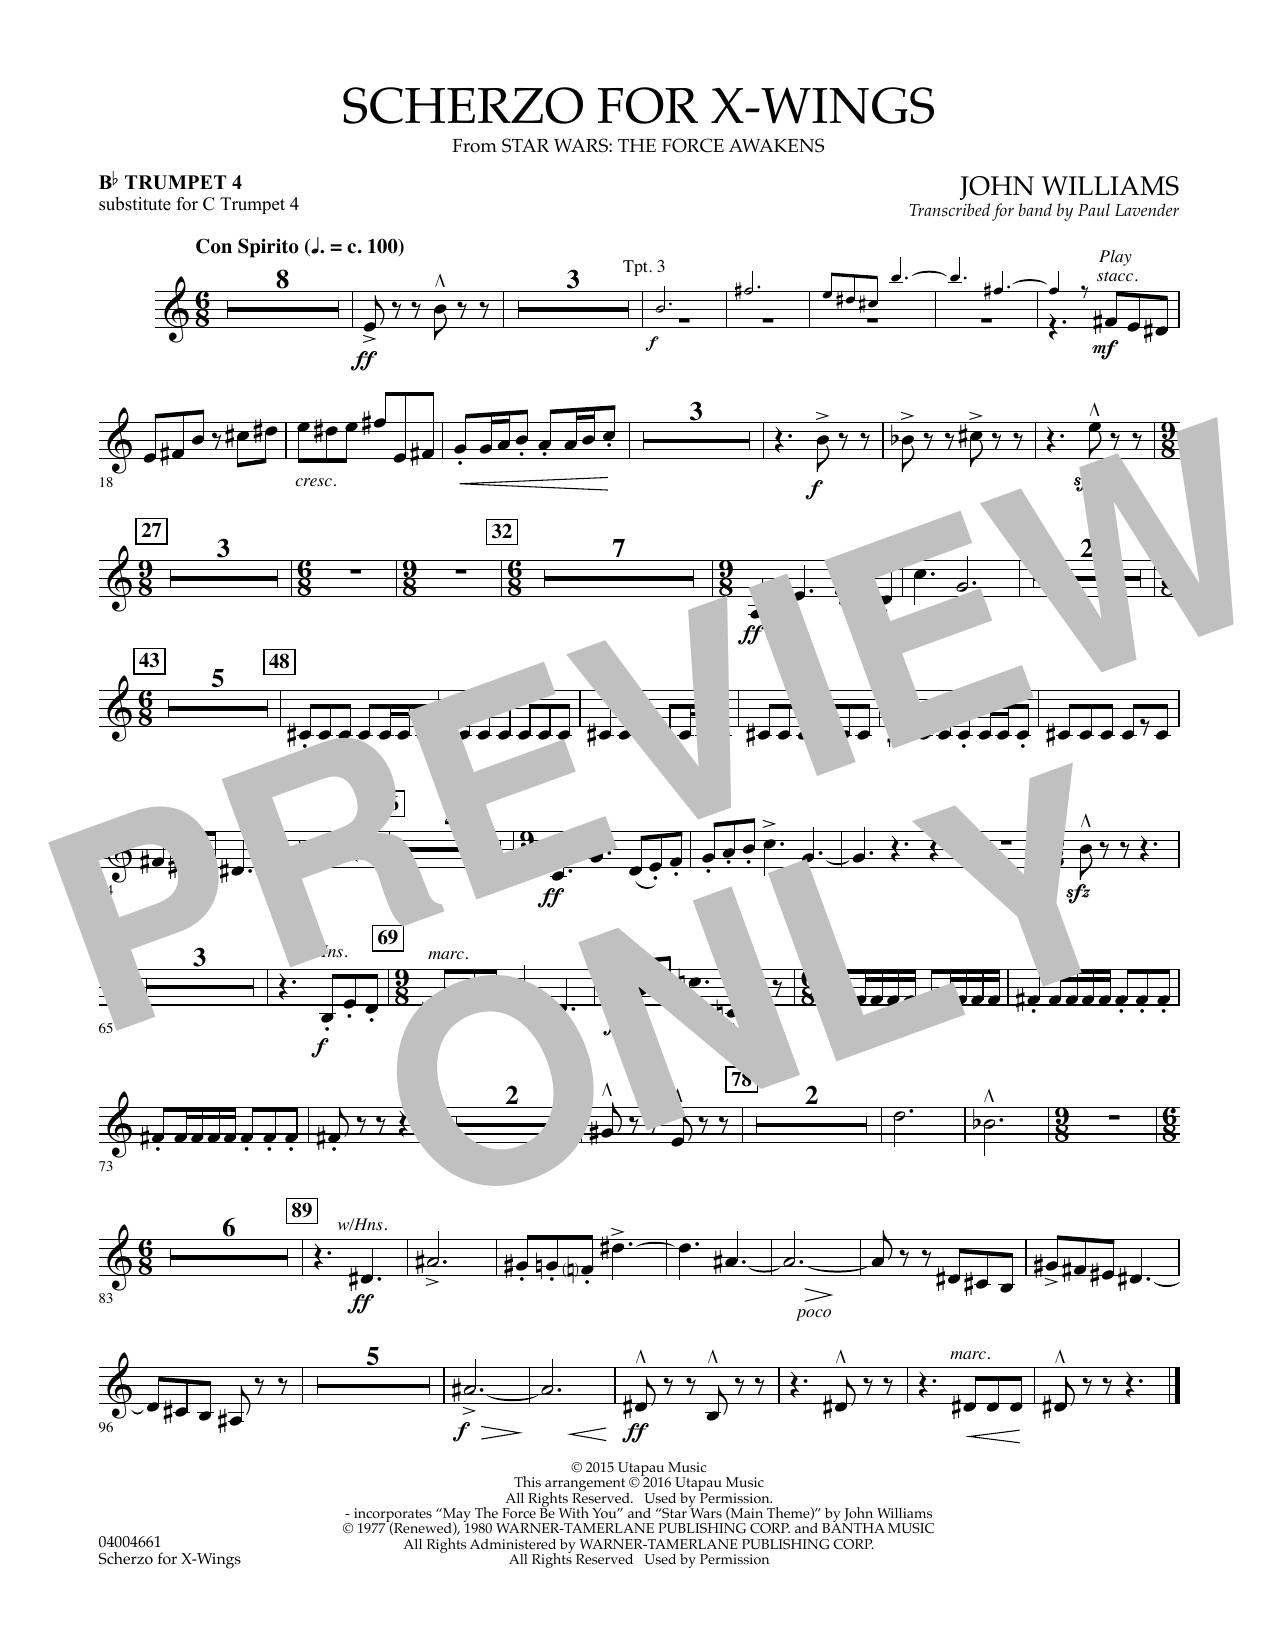 Scherzo for X-Wings - Bb Trumpet parts - Bb Trumpet 4 (sub. C Tpt. 4)